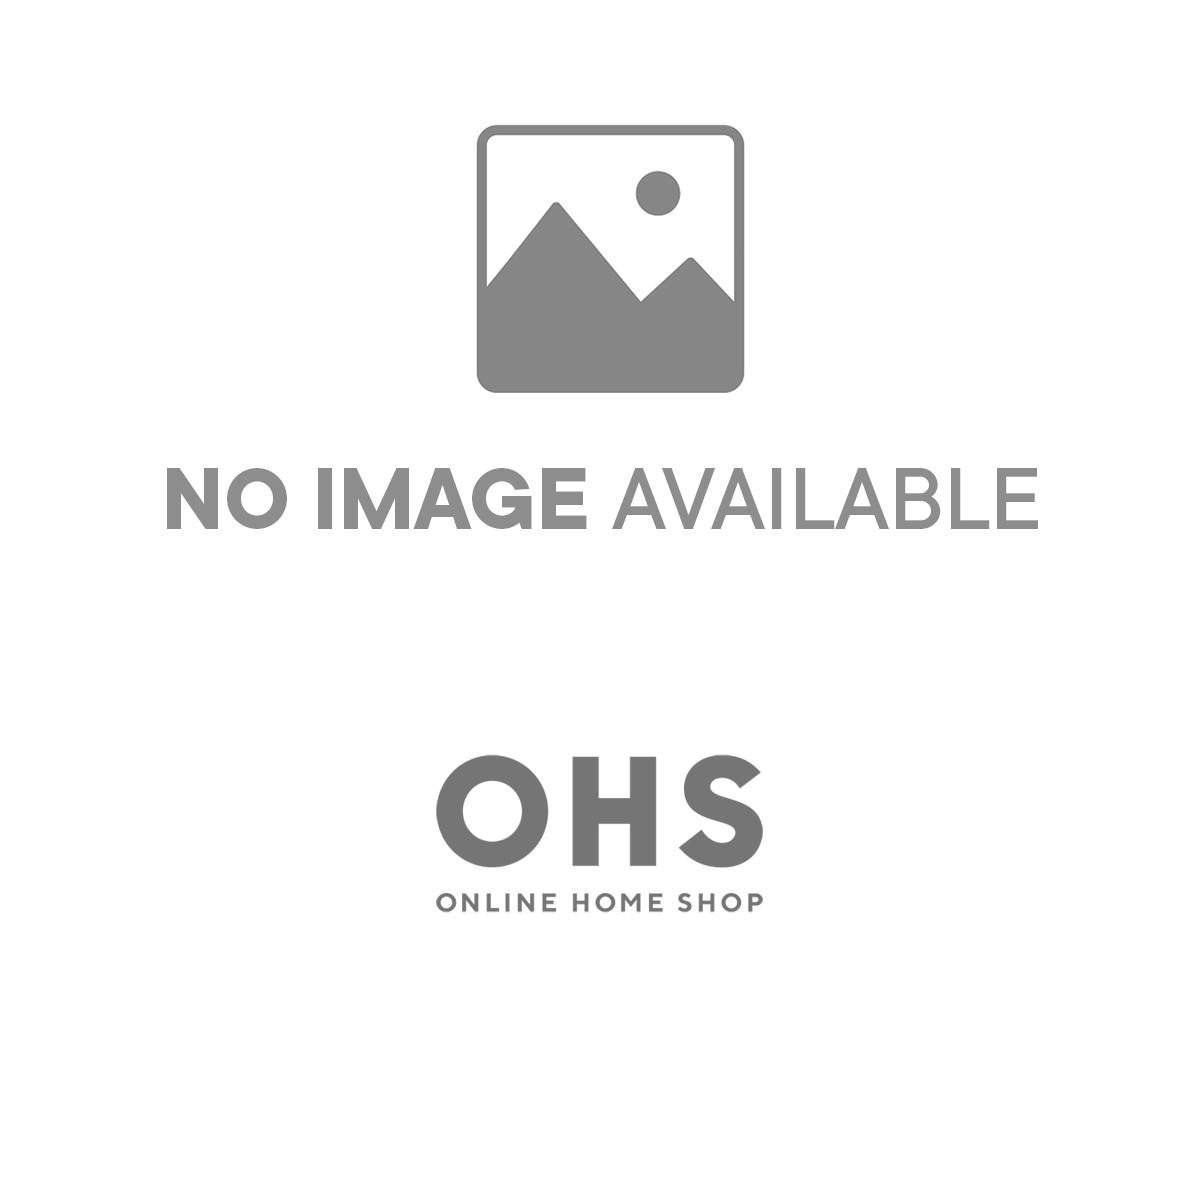 Dreamscene Towel Bale 10 Piece - Charcoal